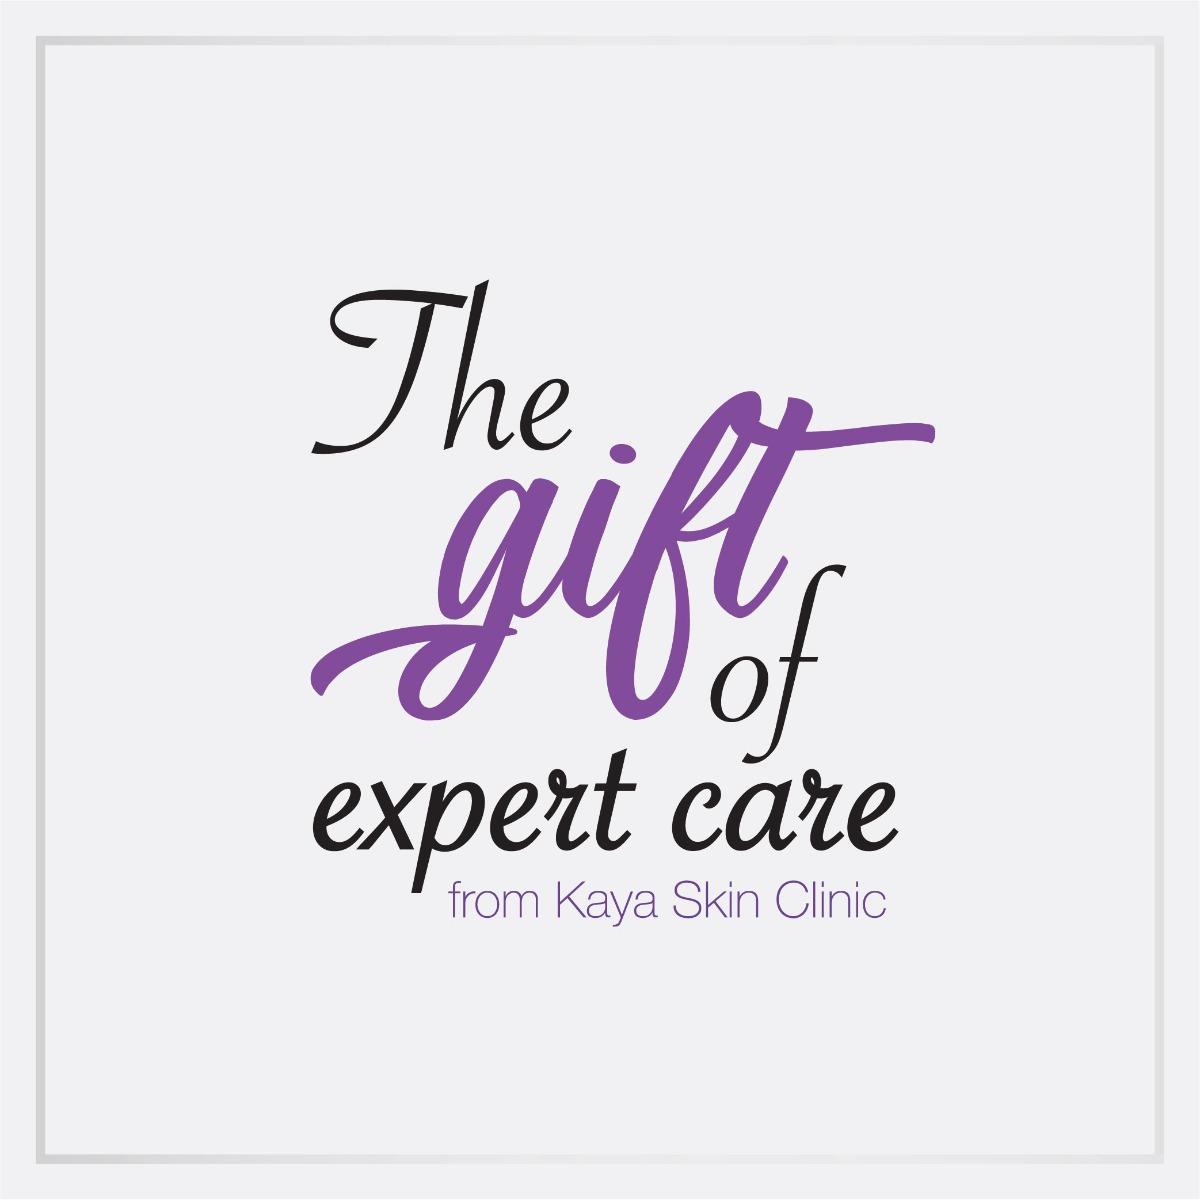 Kaya Services & Kaya products worth of 1000 AED